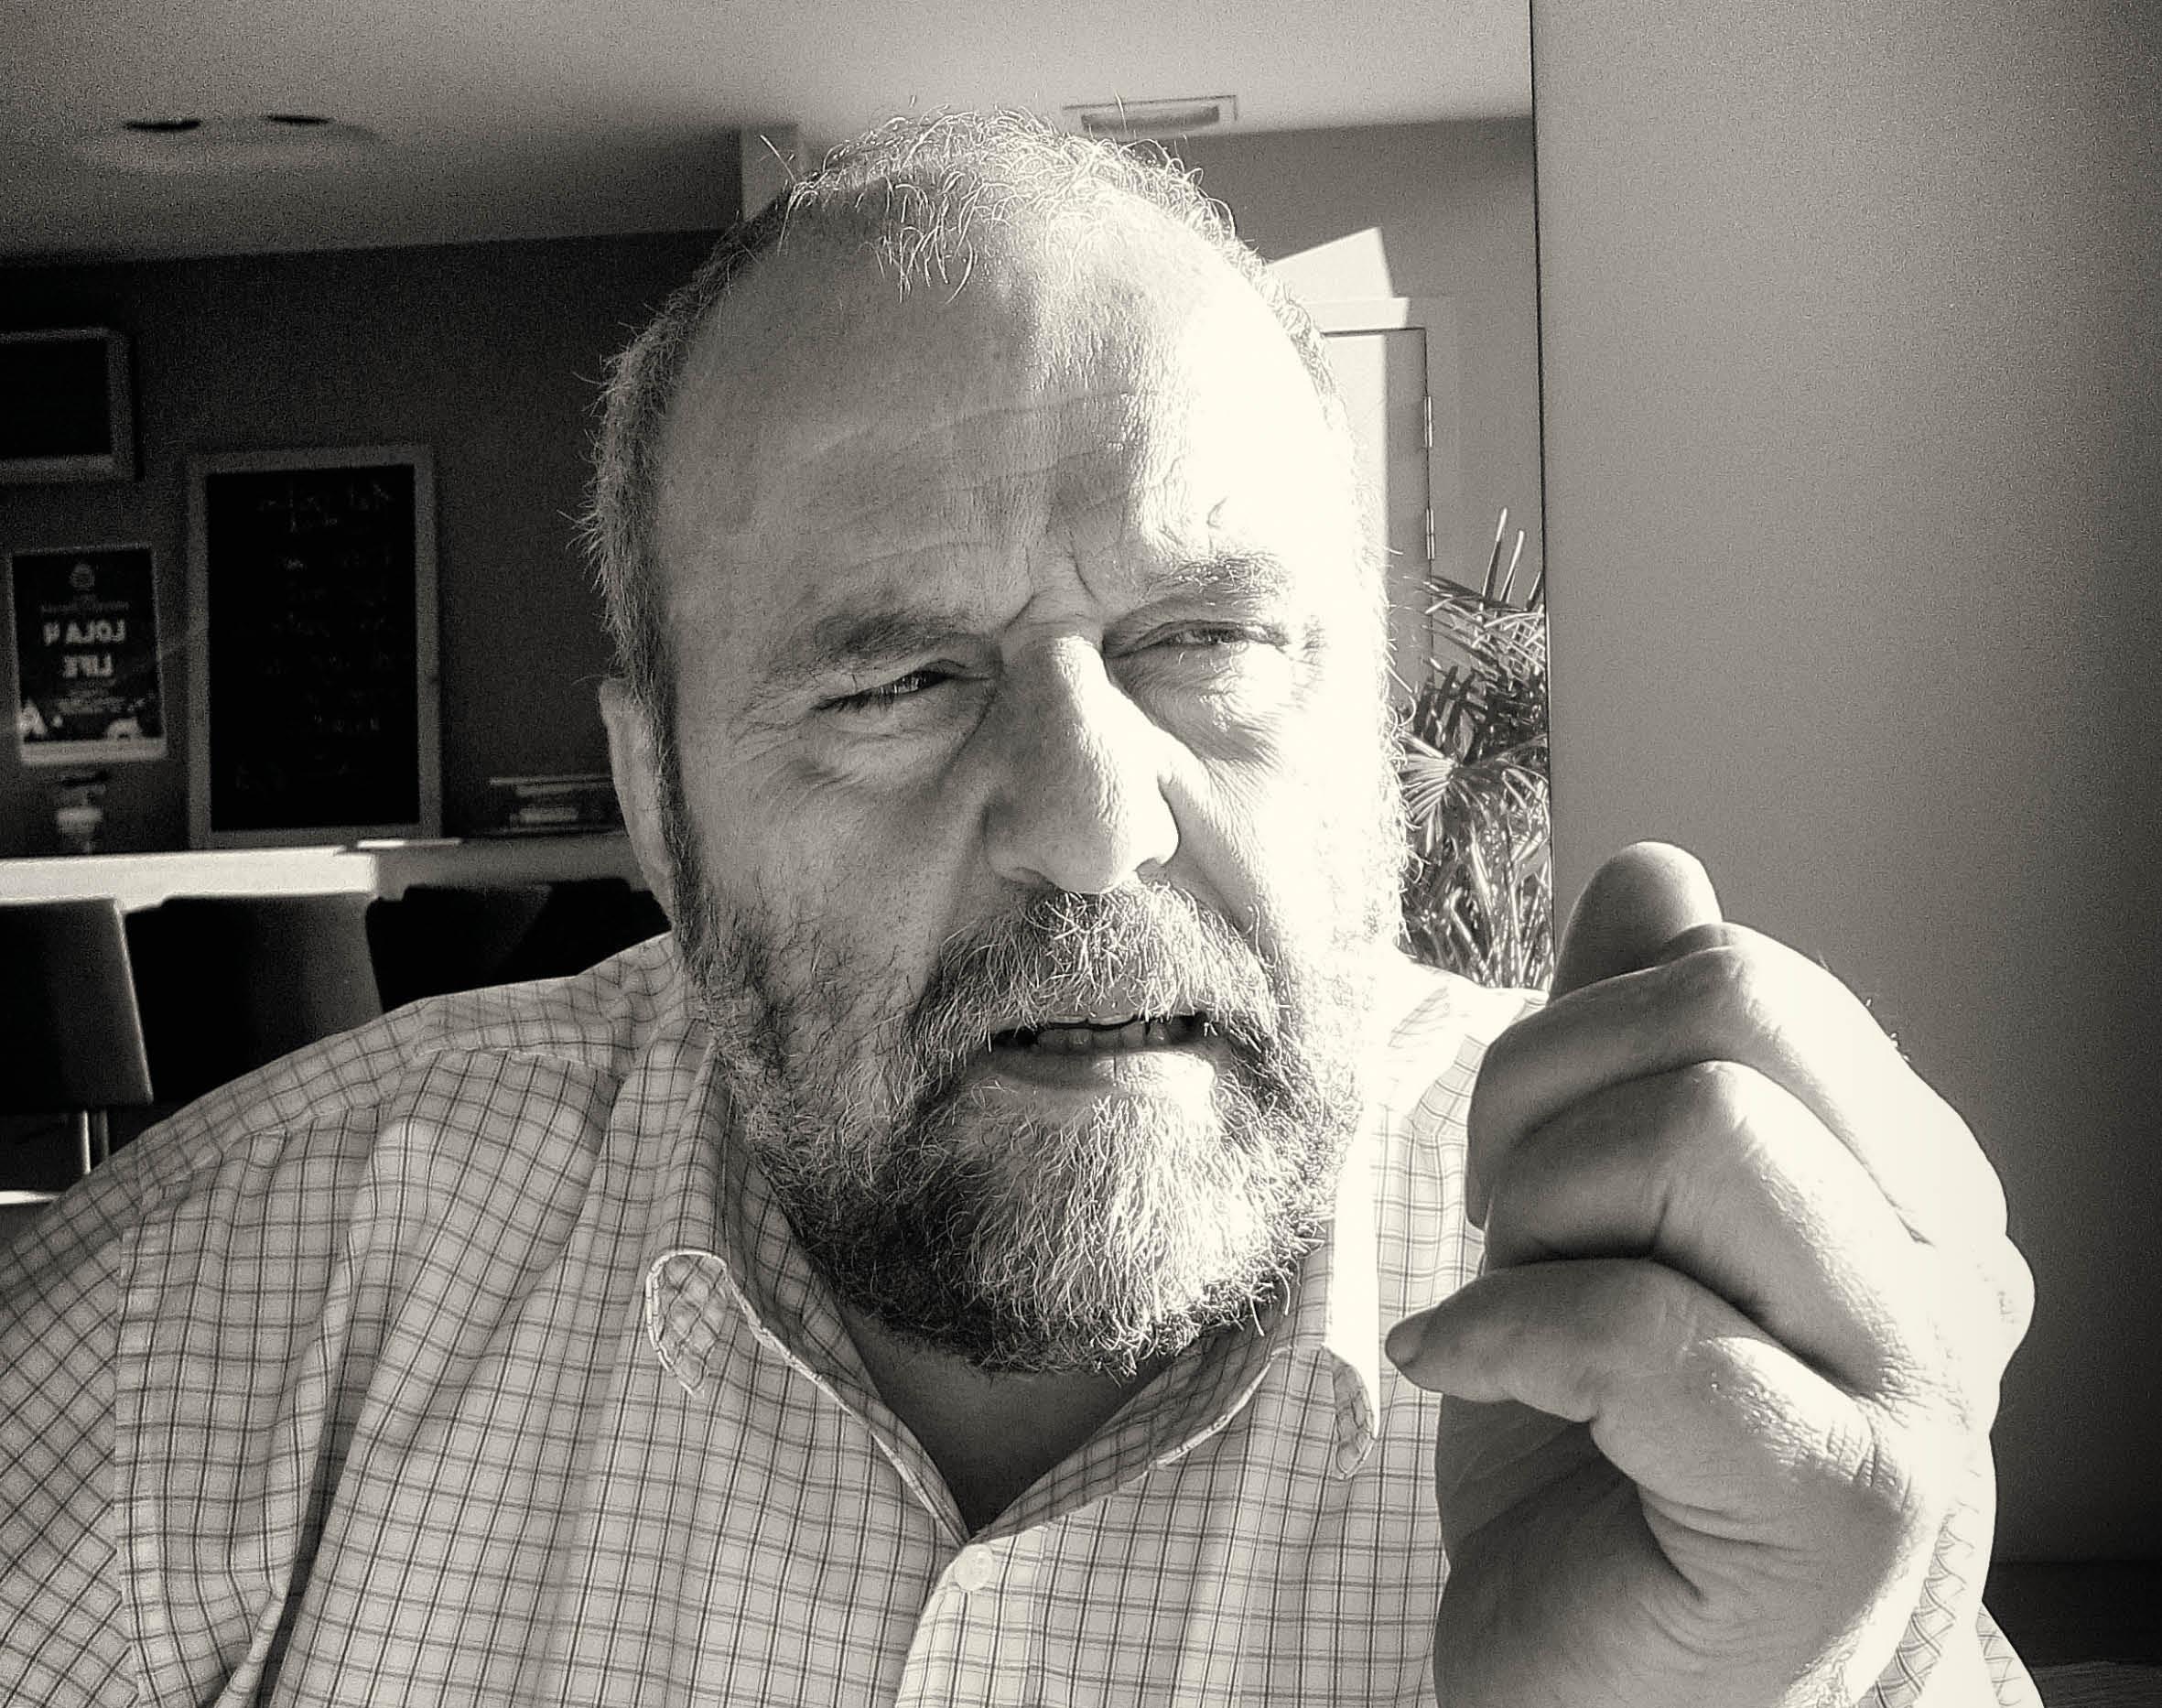 Pieter Waldack